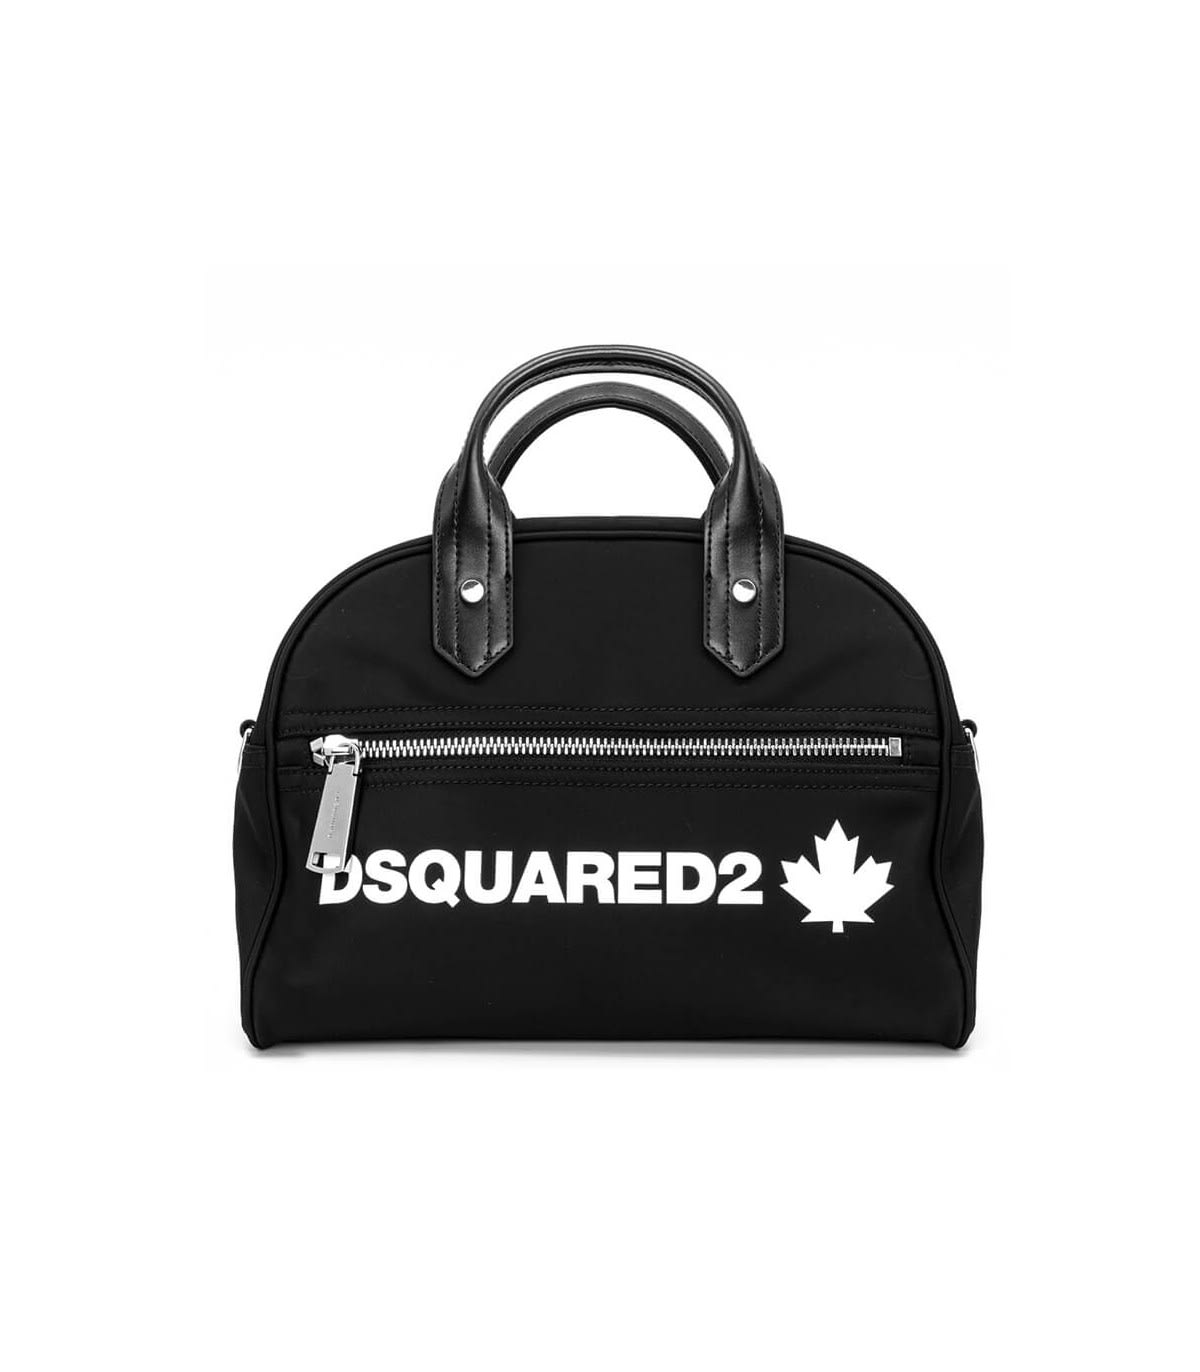 Dsquared2 Leathers BLACK HANDBAG WITH WHITE LOGO